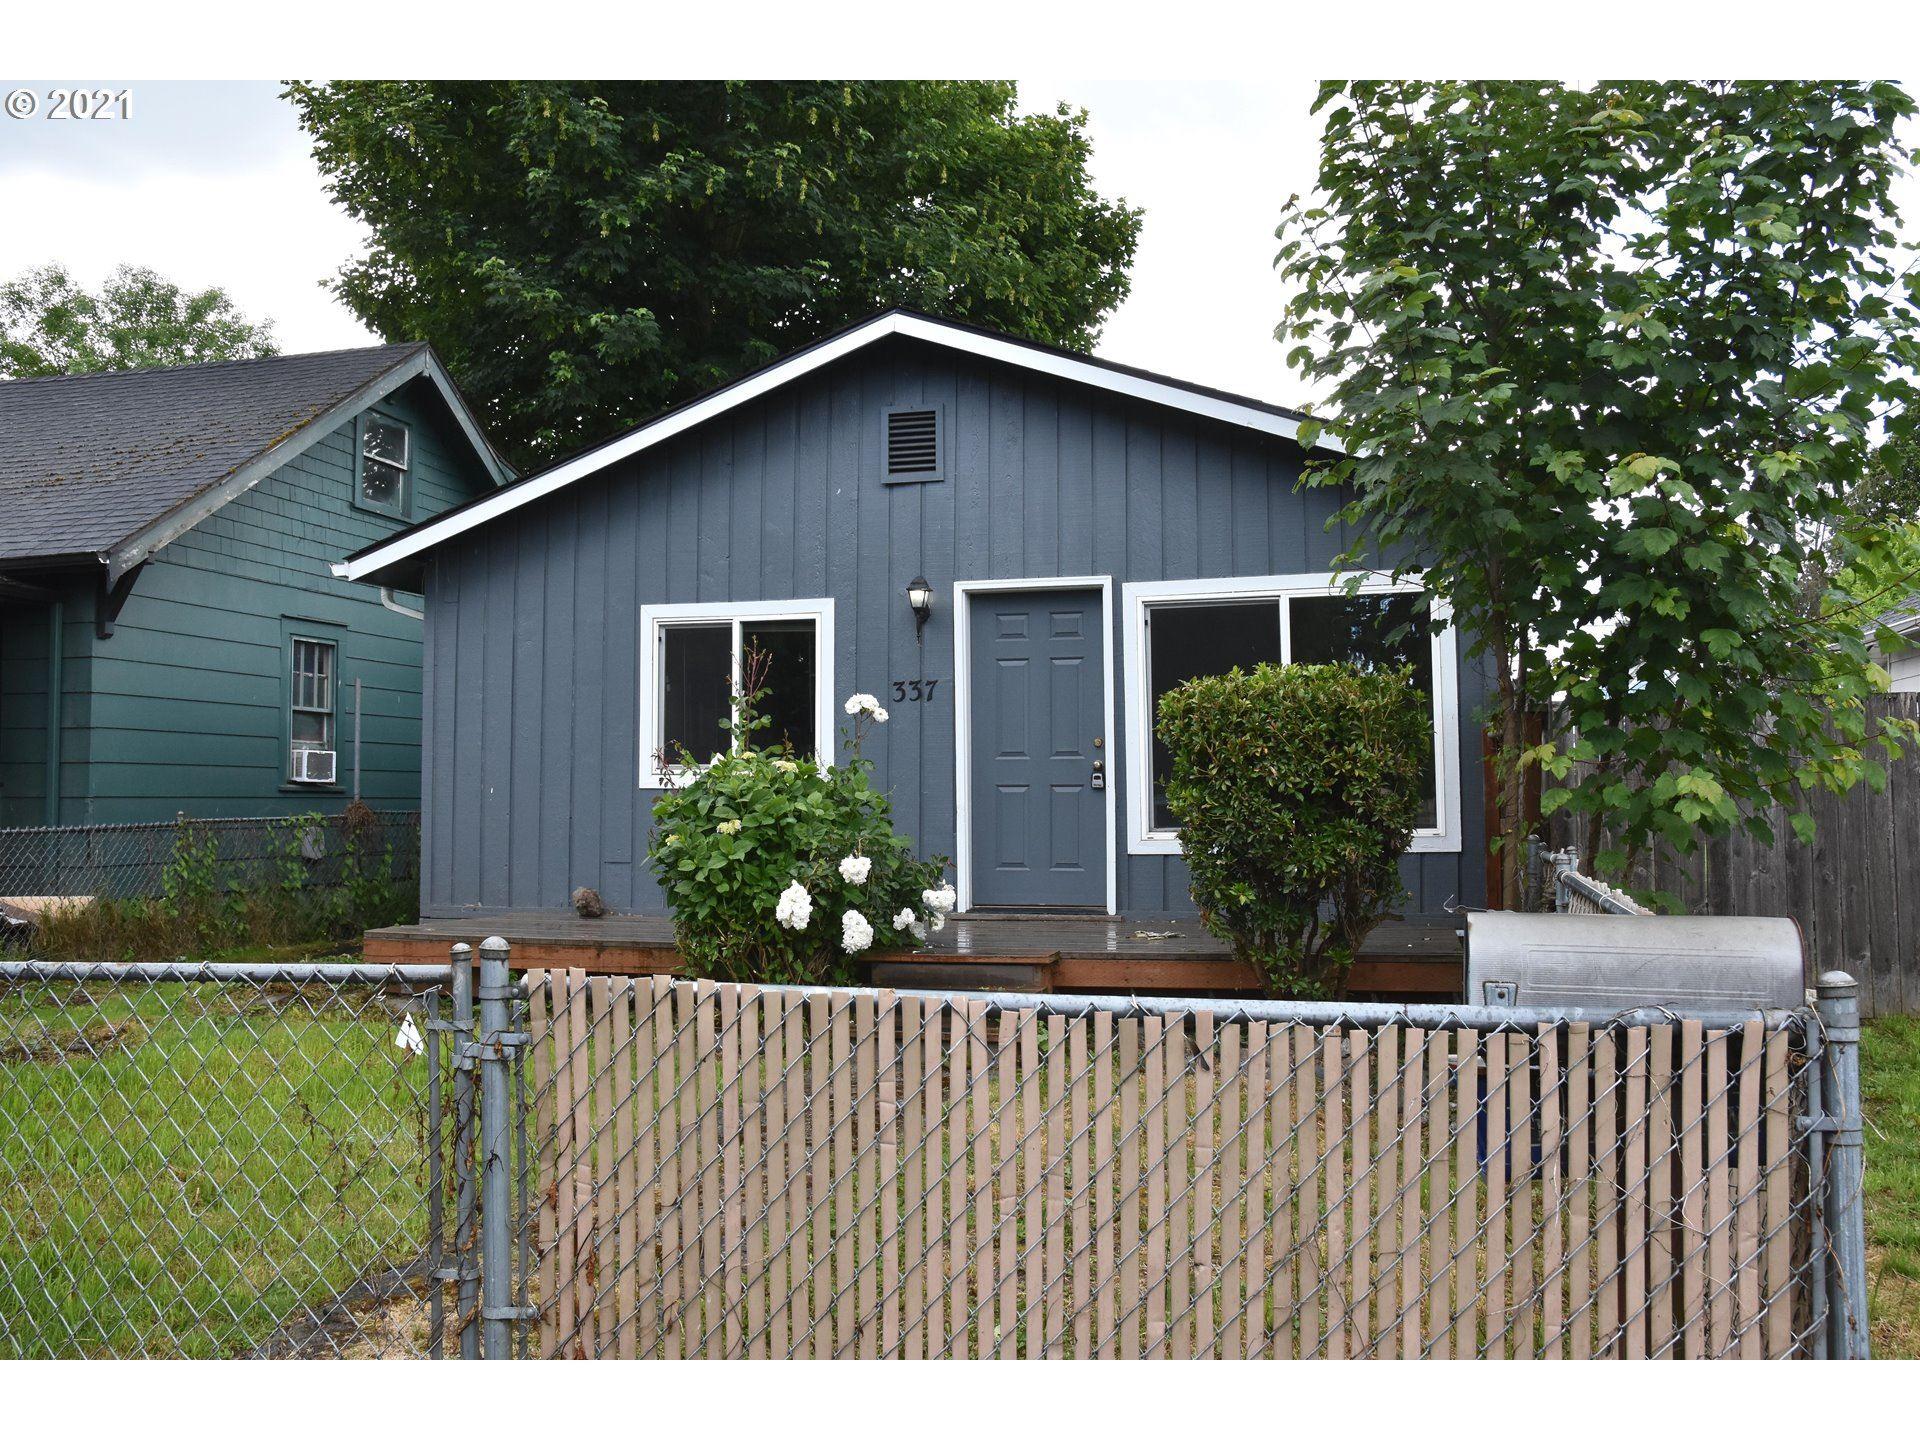 337 21ST AVE, Longview, WA 98632 - MLS#: 21641208